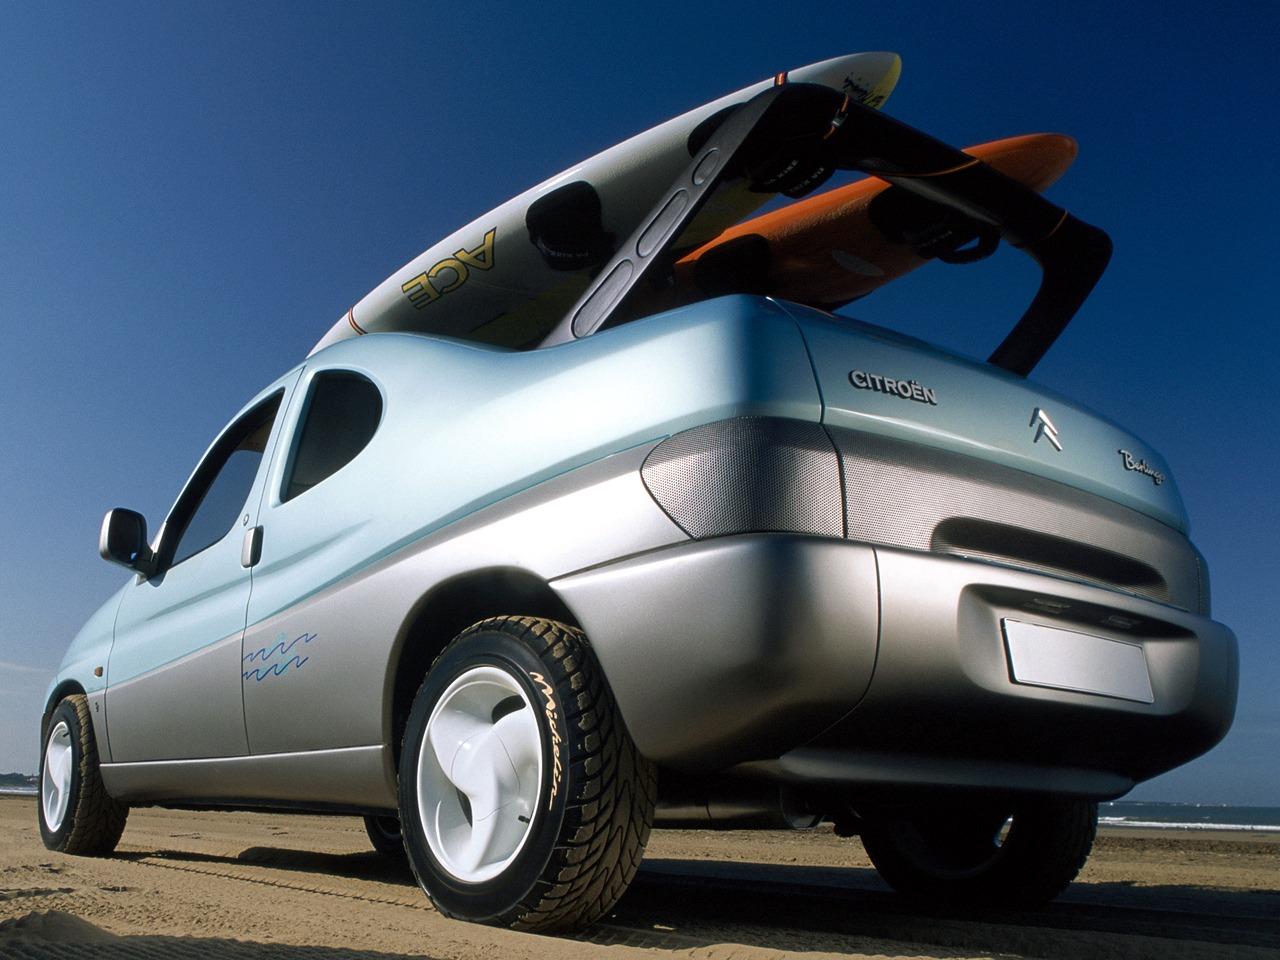 citro n berlingo coup de plage 1996 old concept cars. Black Bedroom Furniture Sets. Home Design Ideas